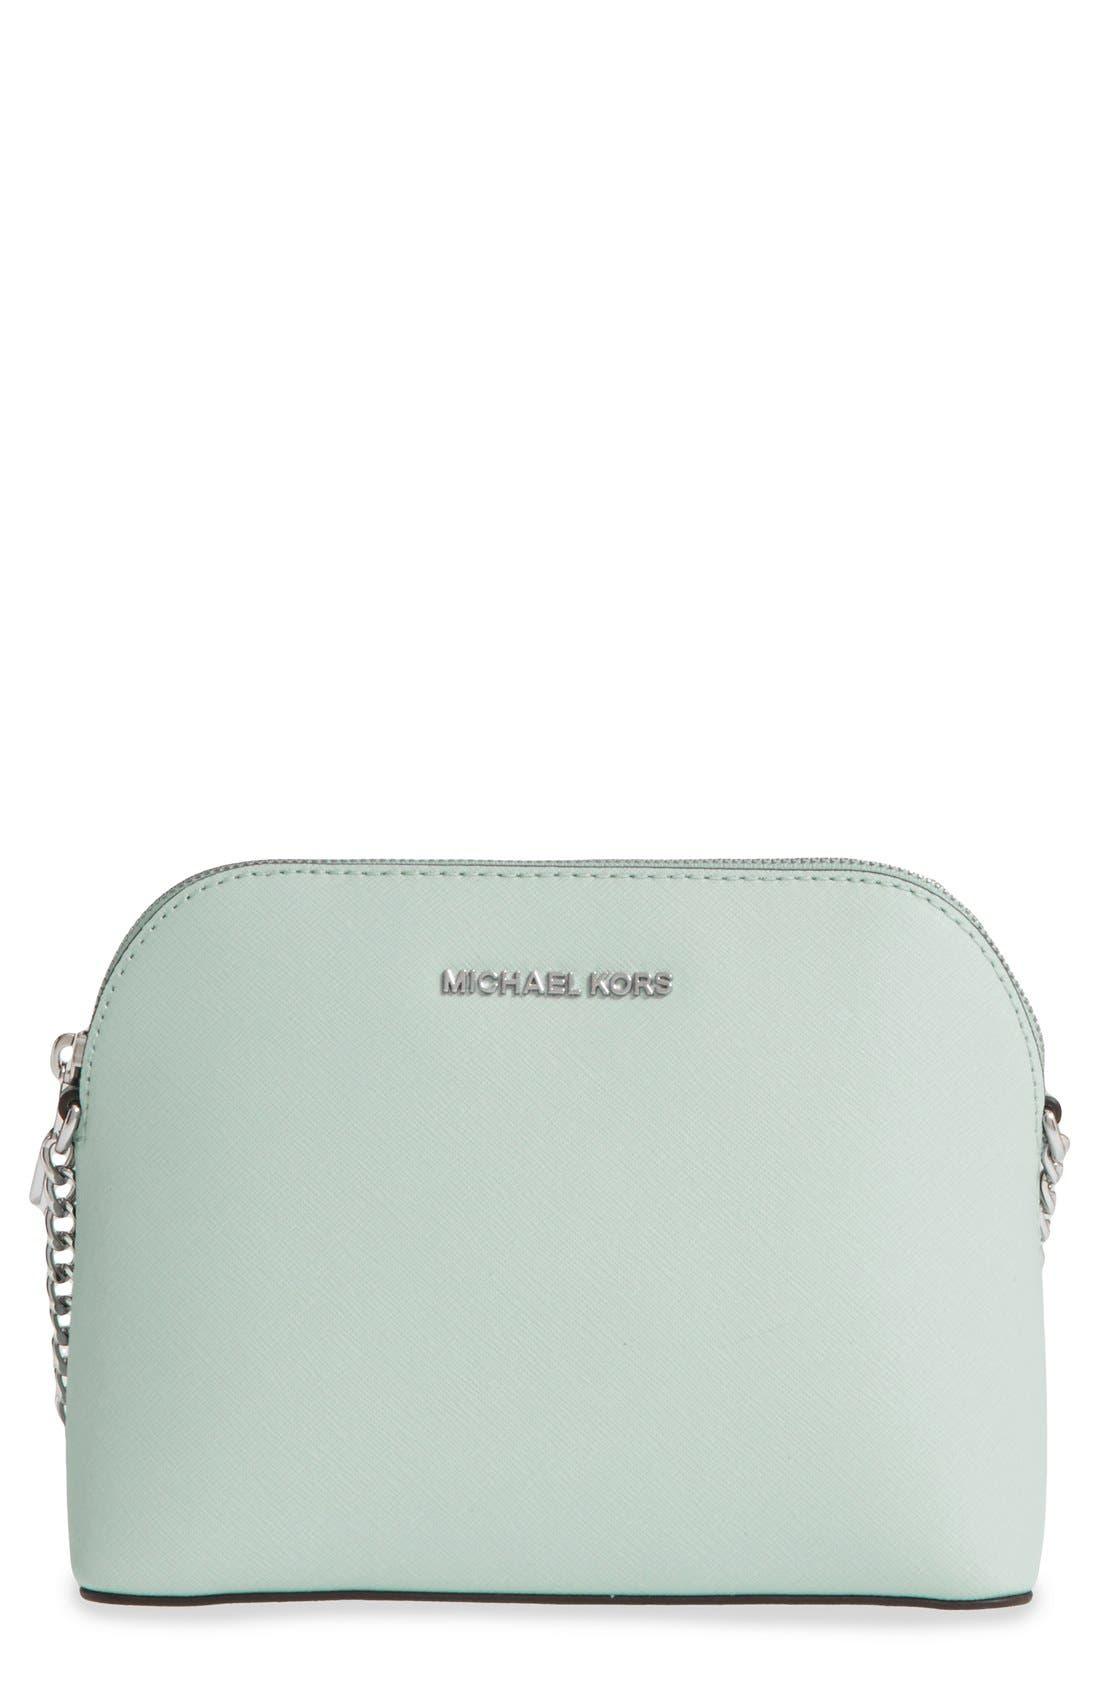 Main Image - MICHAEL Michael Kors 'Large Cindy' Saffiano Leather Crossbody Bag